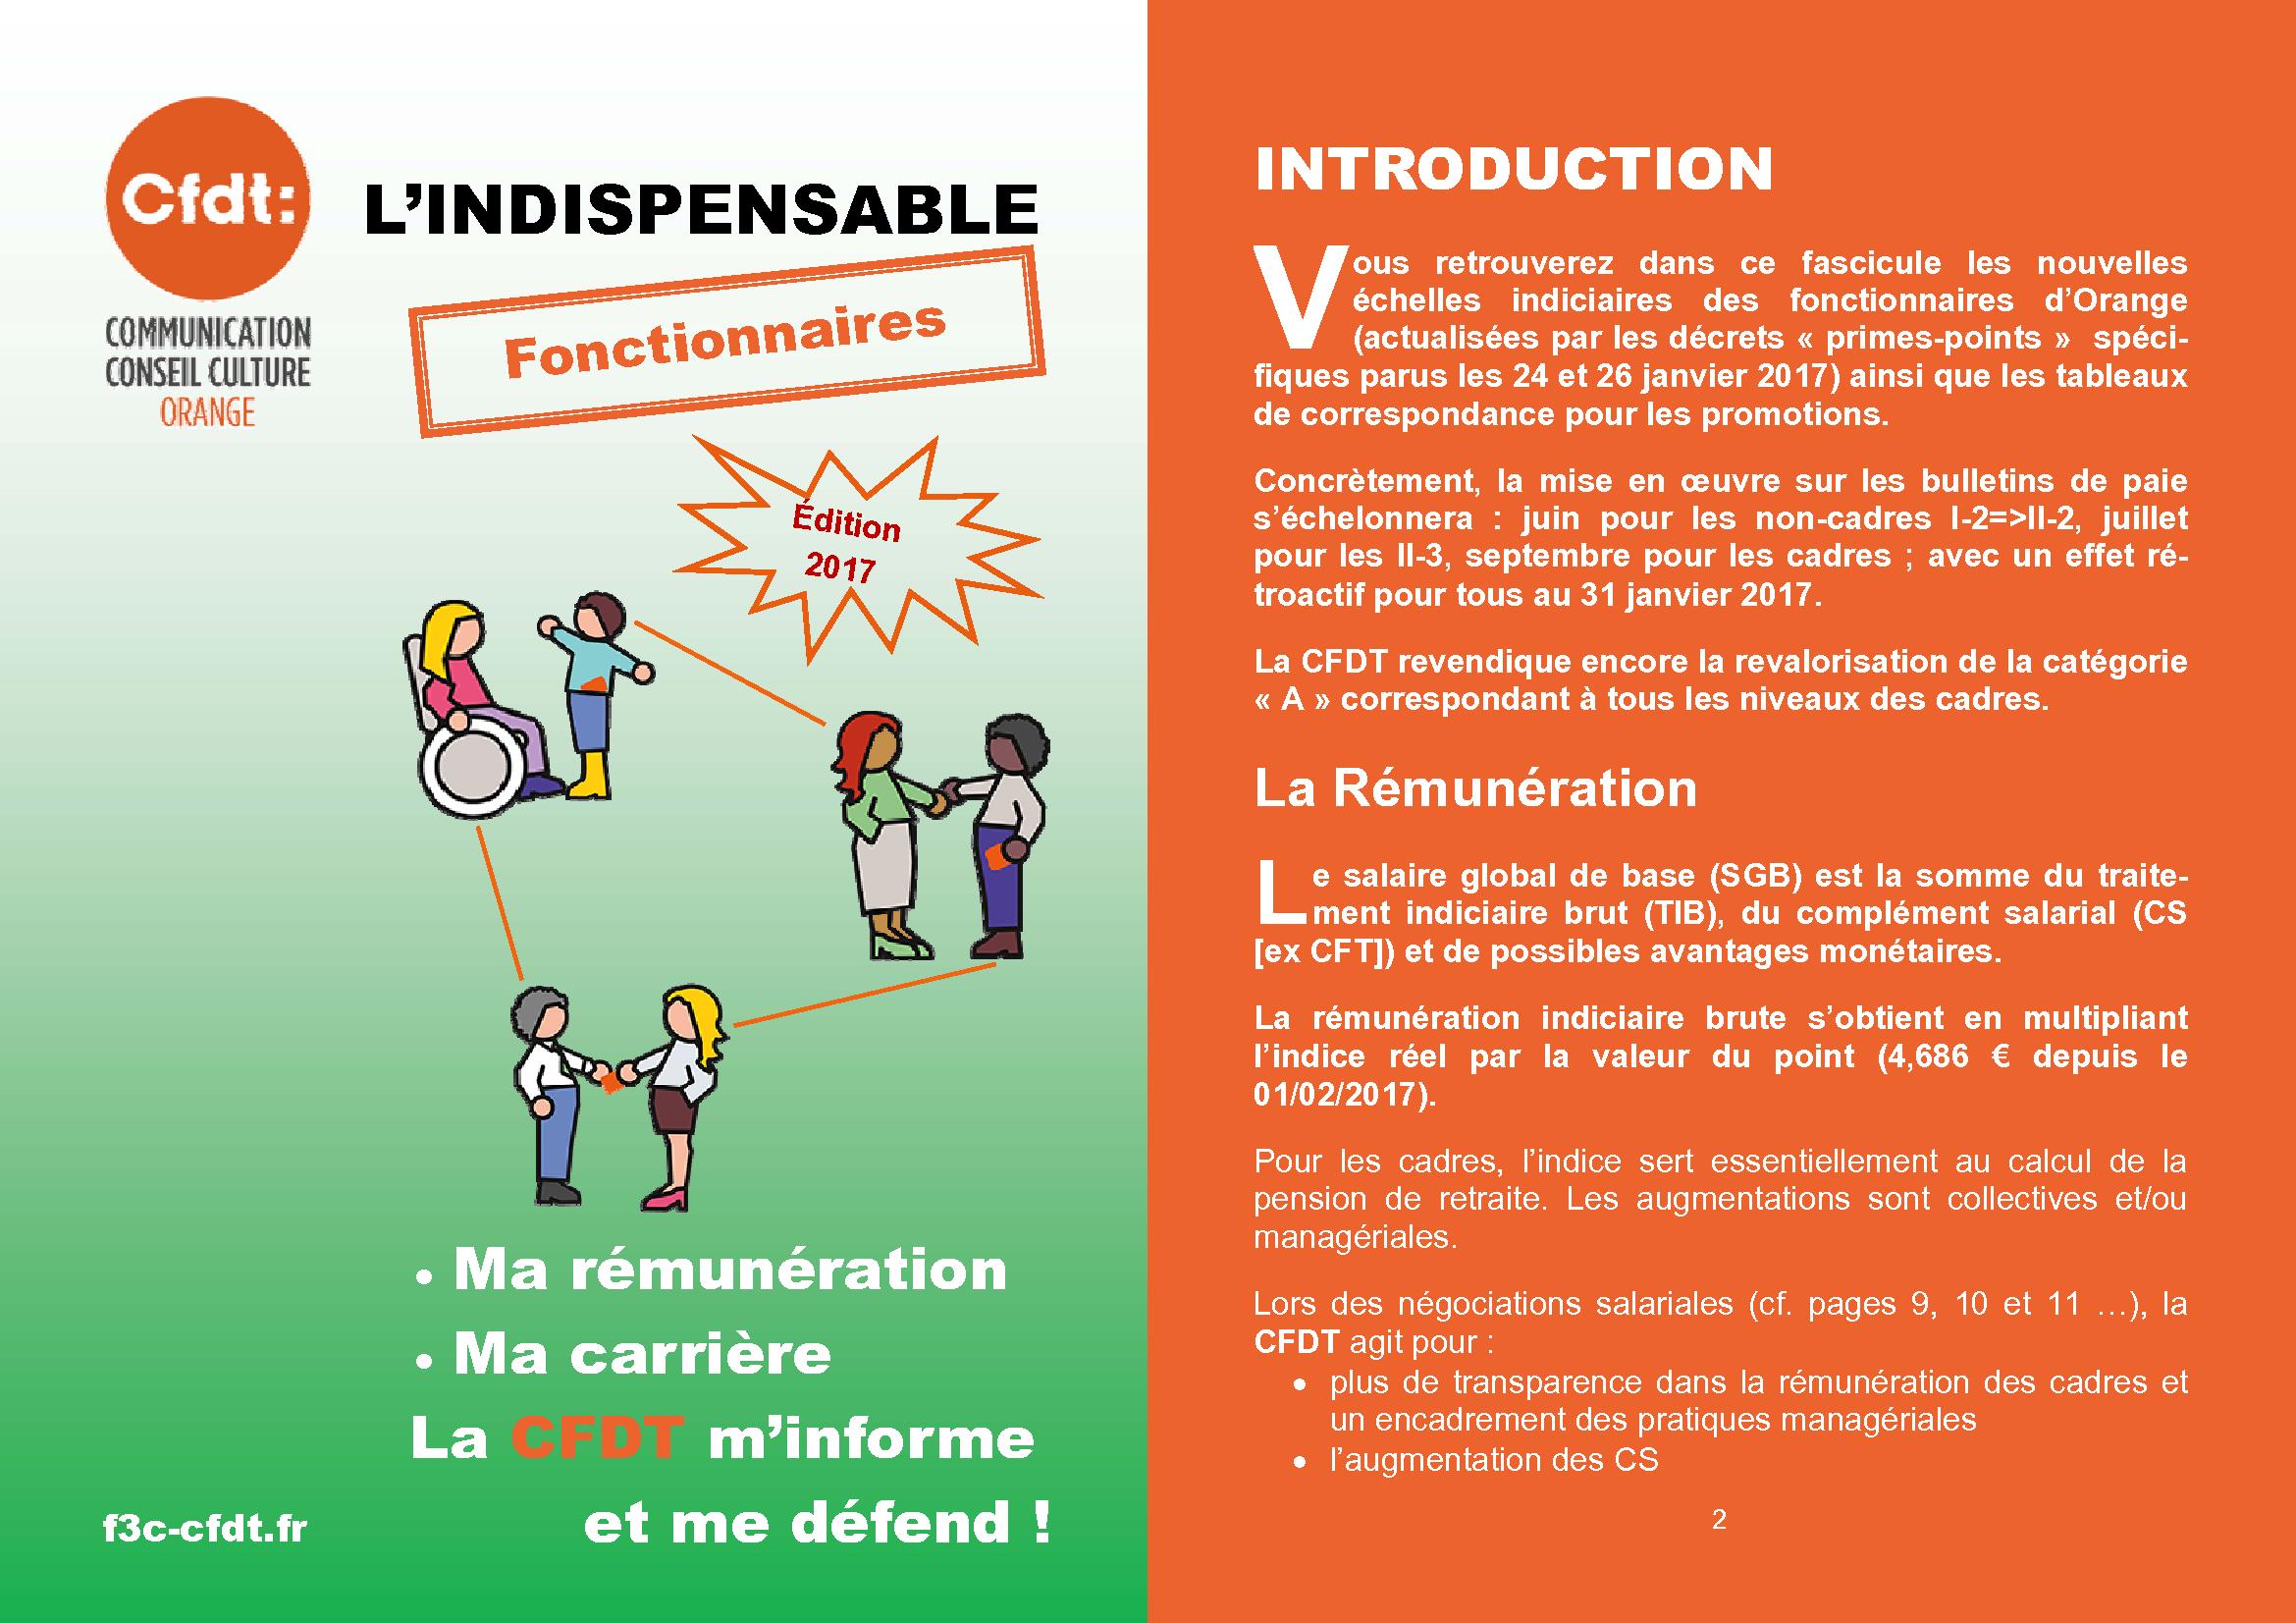 http://www.emailing.sce.cfdt-ftorange.fr/images/ScePublicCom/Livrets/20170604-Liaison-Orange_Indispensable-Fonctionnaire_2017.pdf